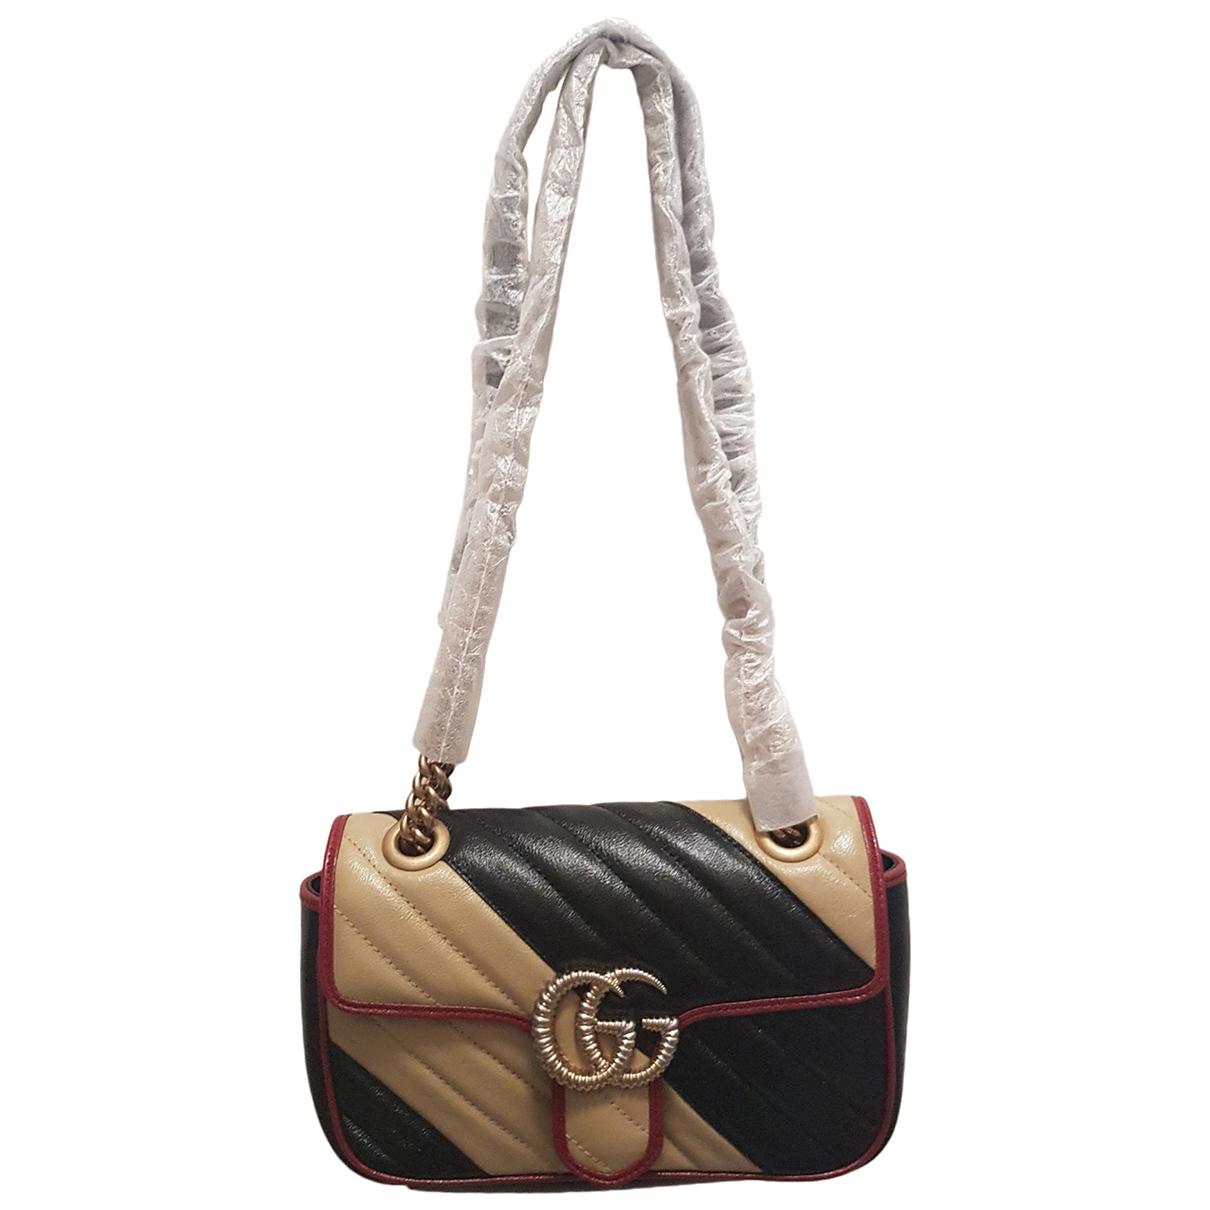 Gucci Marmont Multicolour Leather handbag for Women N